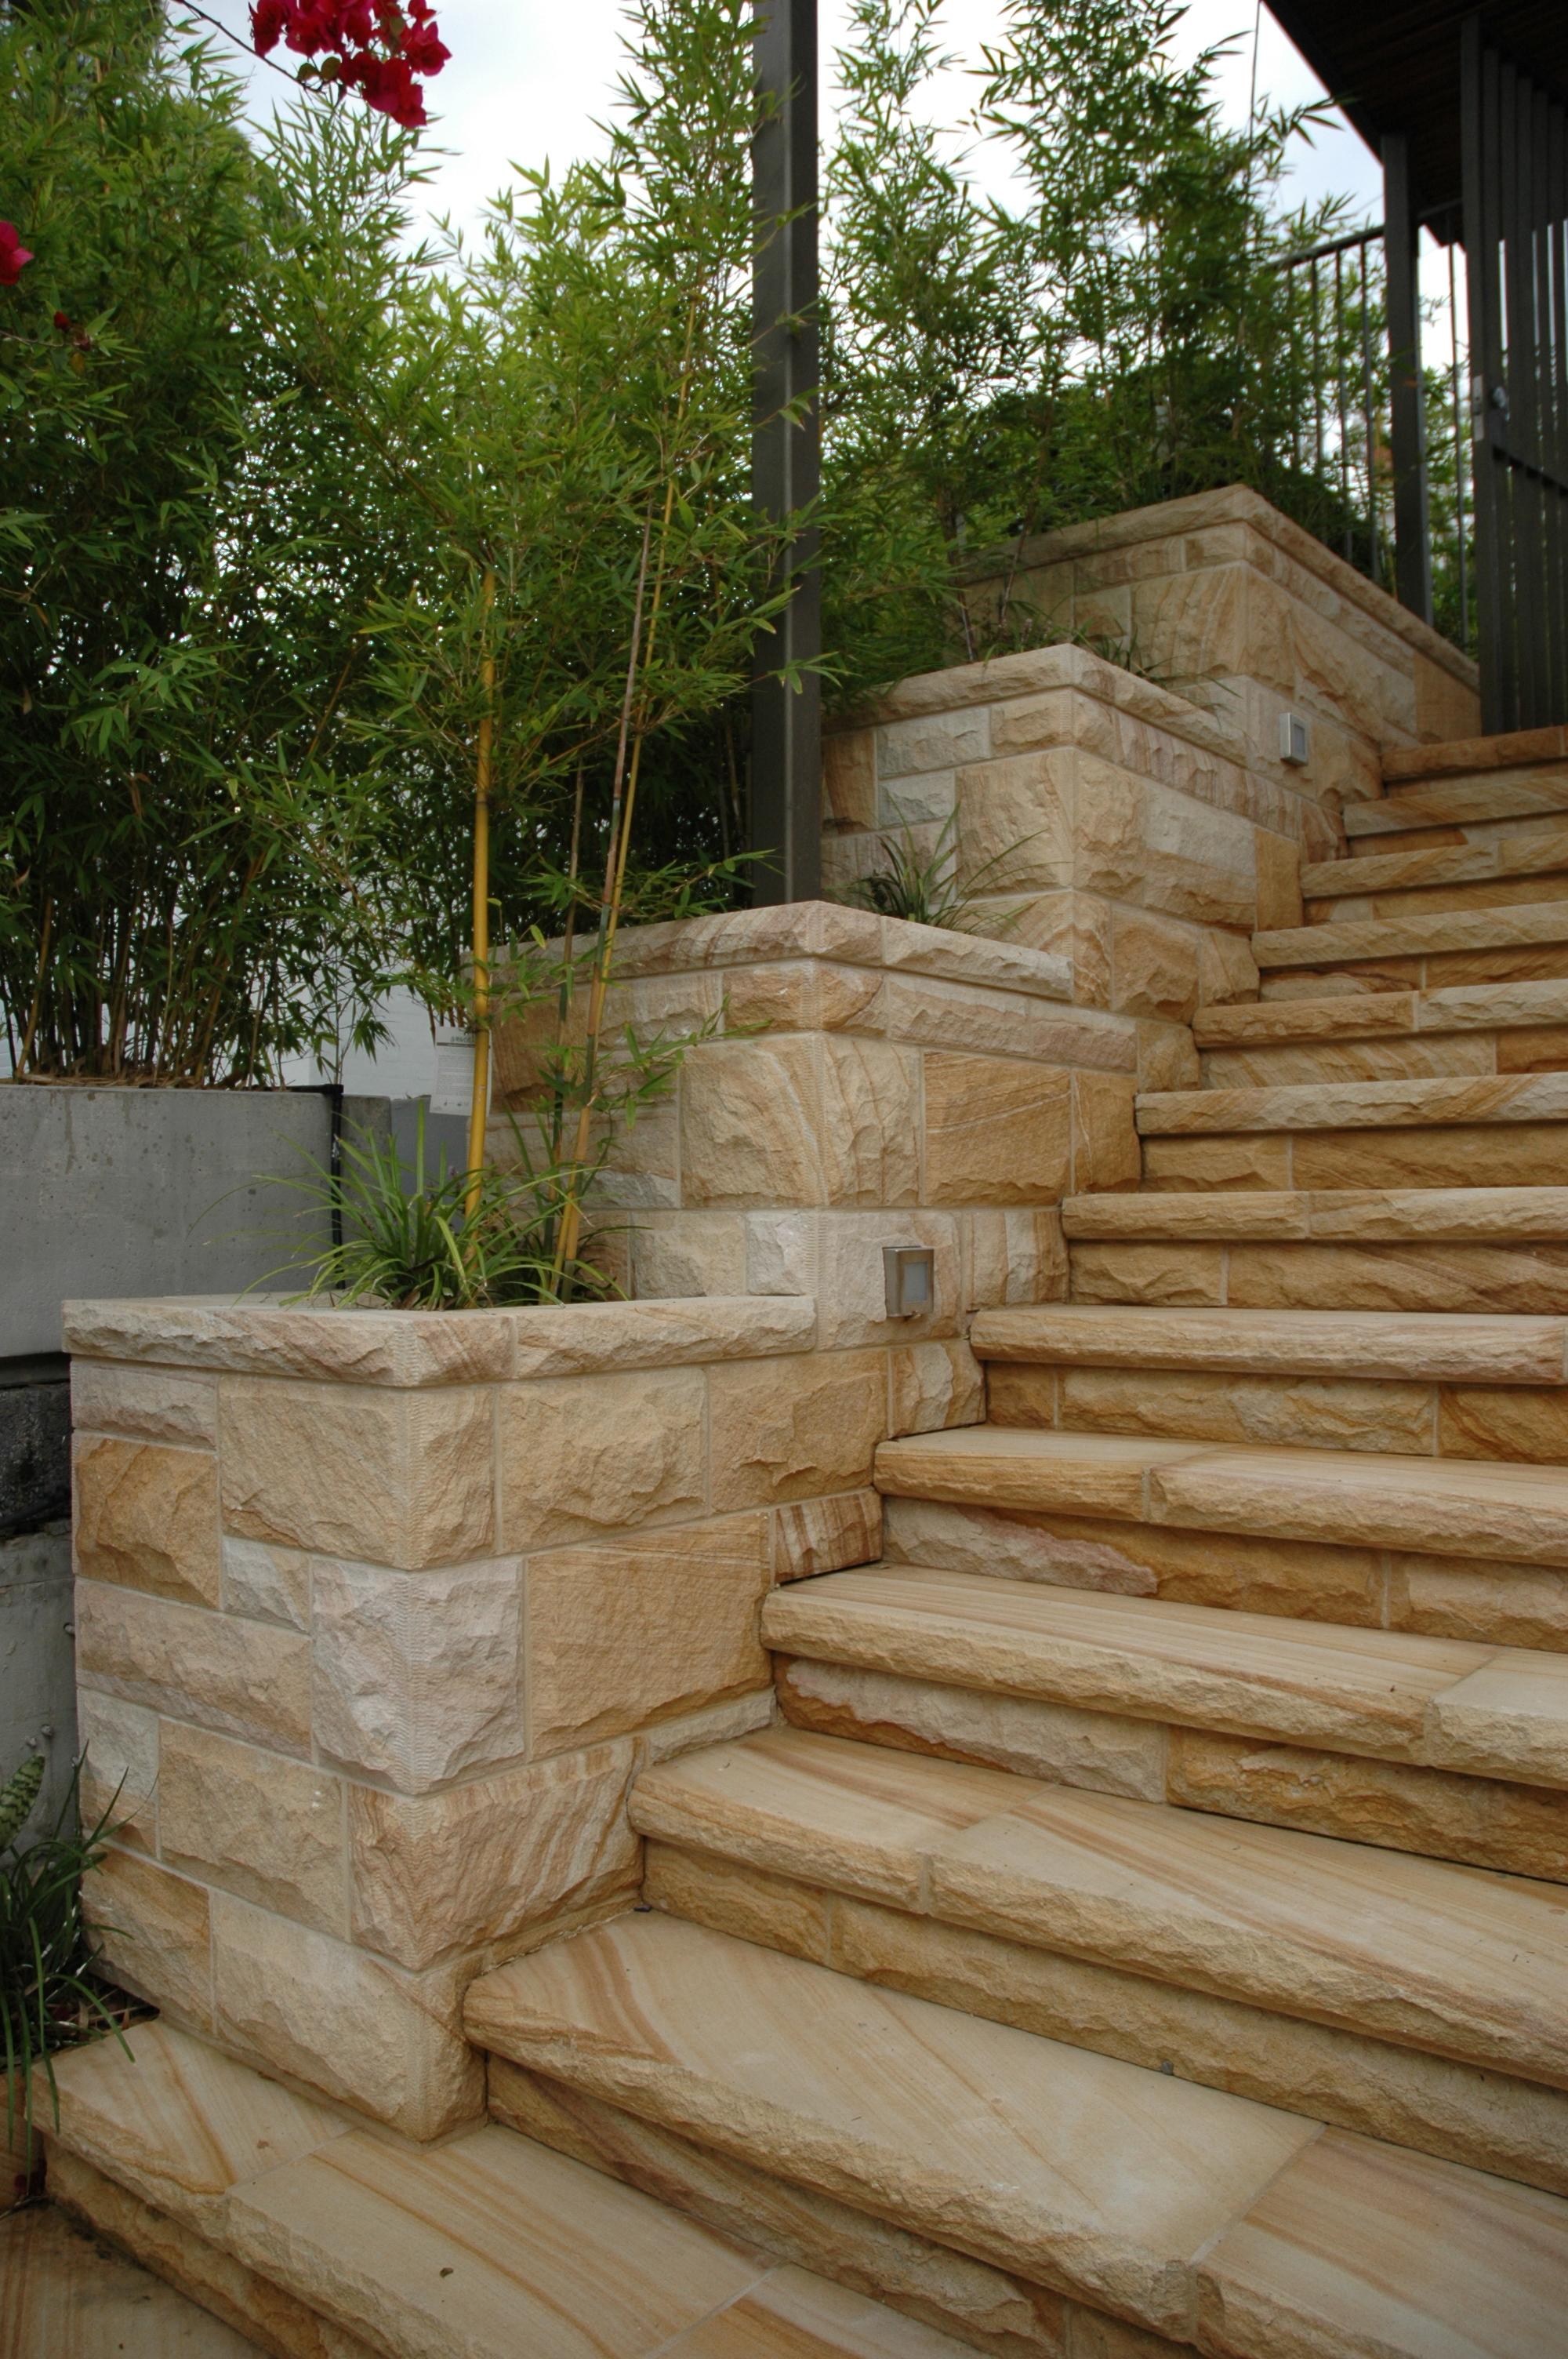 medium brown Random Square rockfaced cladding and stair case details rockfaced steps garden edge planter box- Artistry in Sandstone (6).JPG